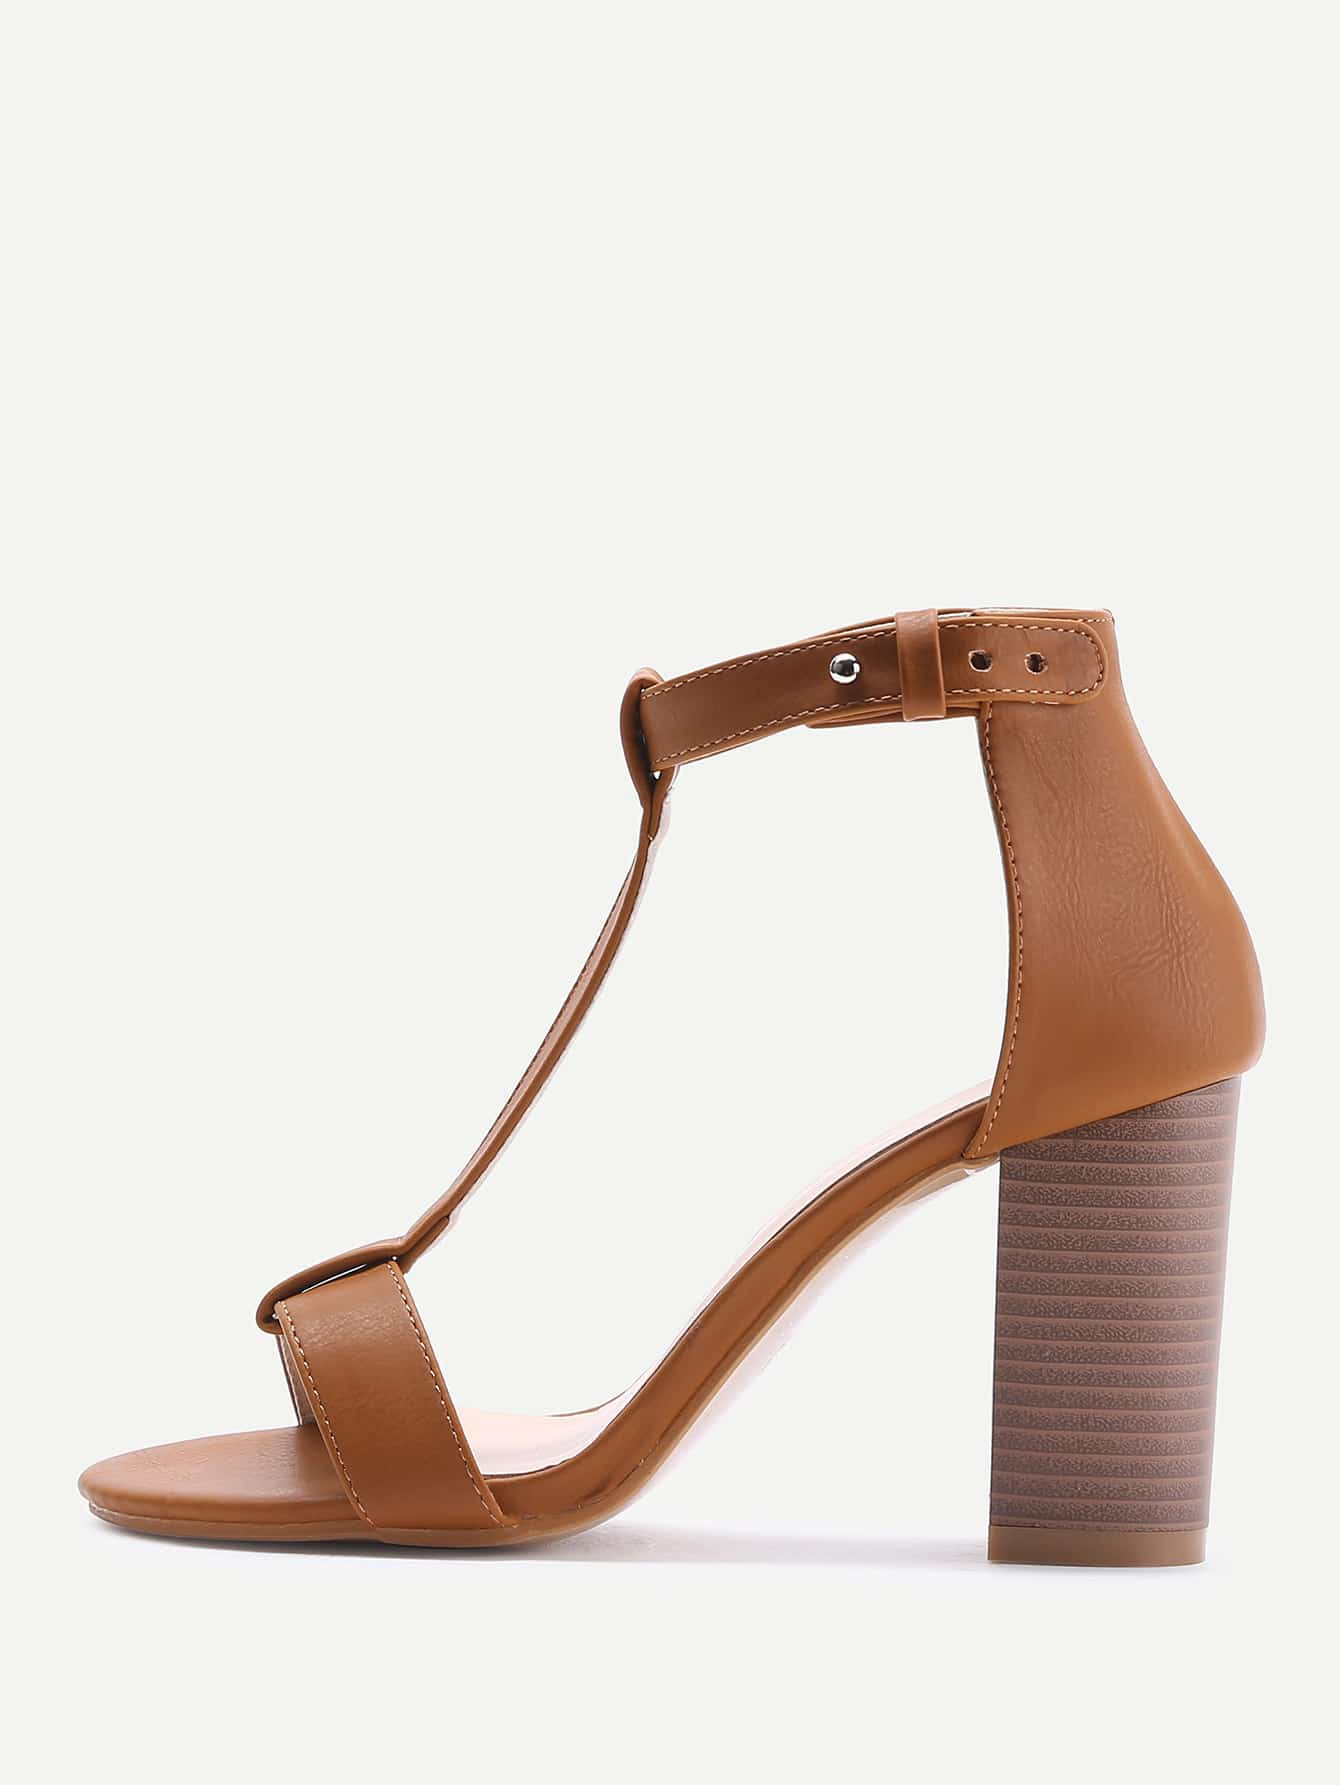 T-strap PU Block Heeled Sandals ankle strap block heeled pu sandals